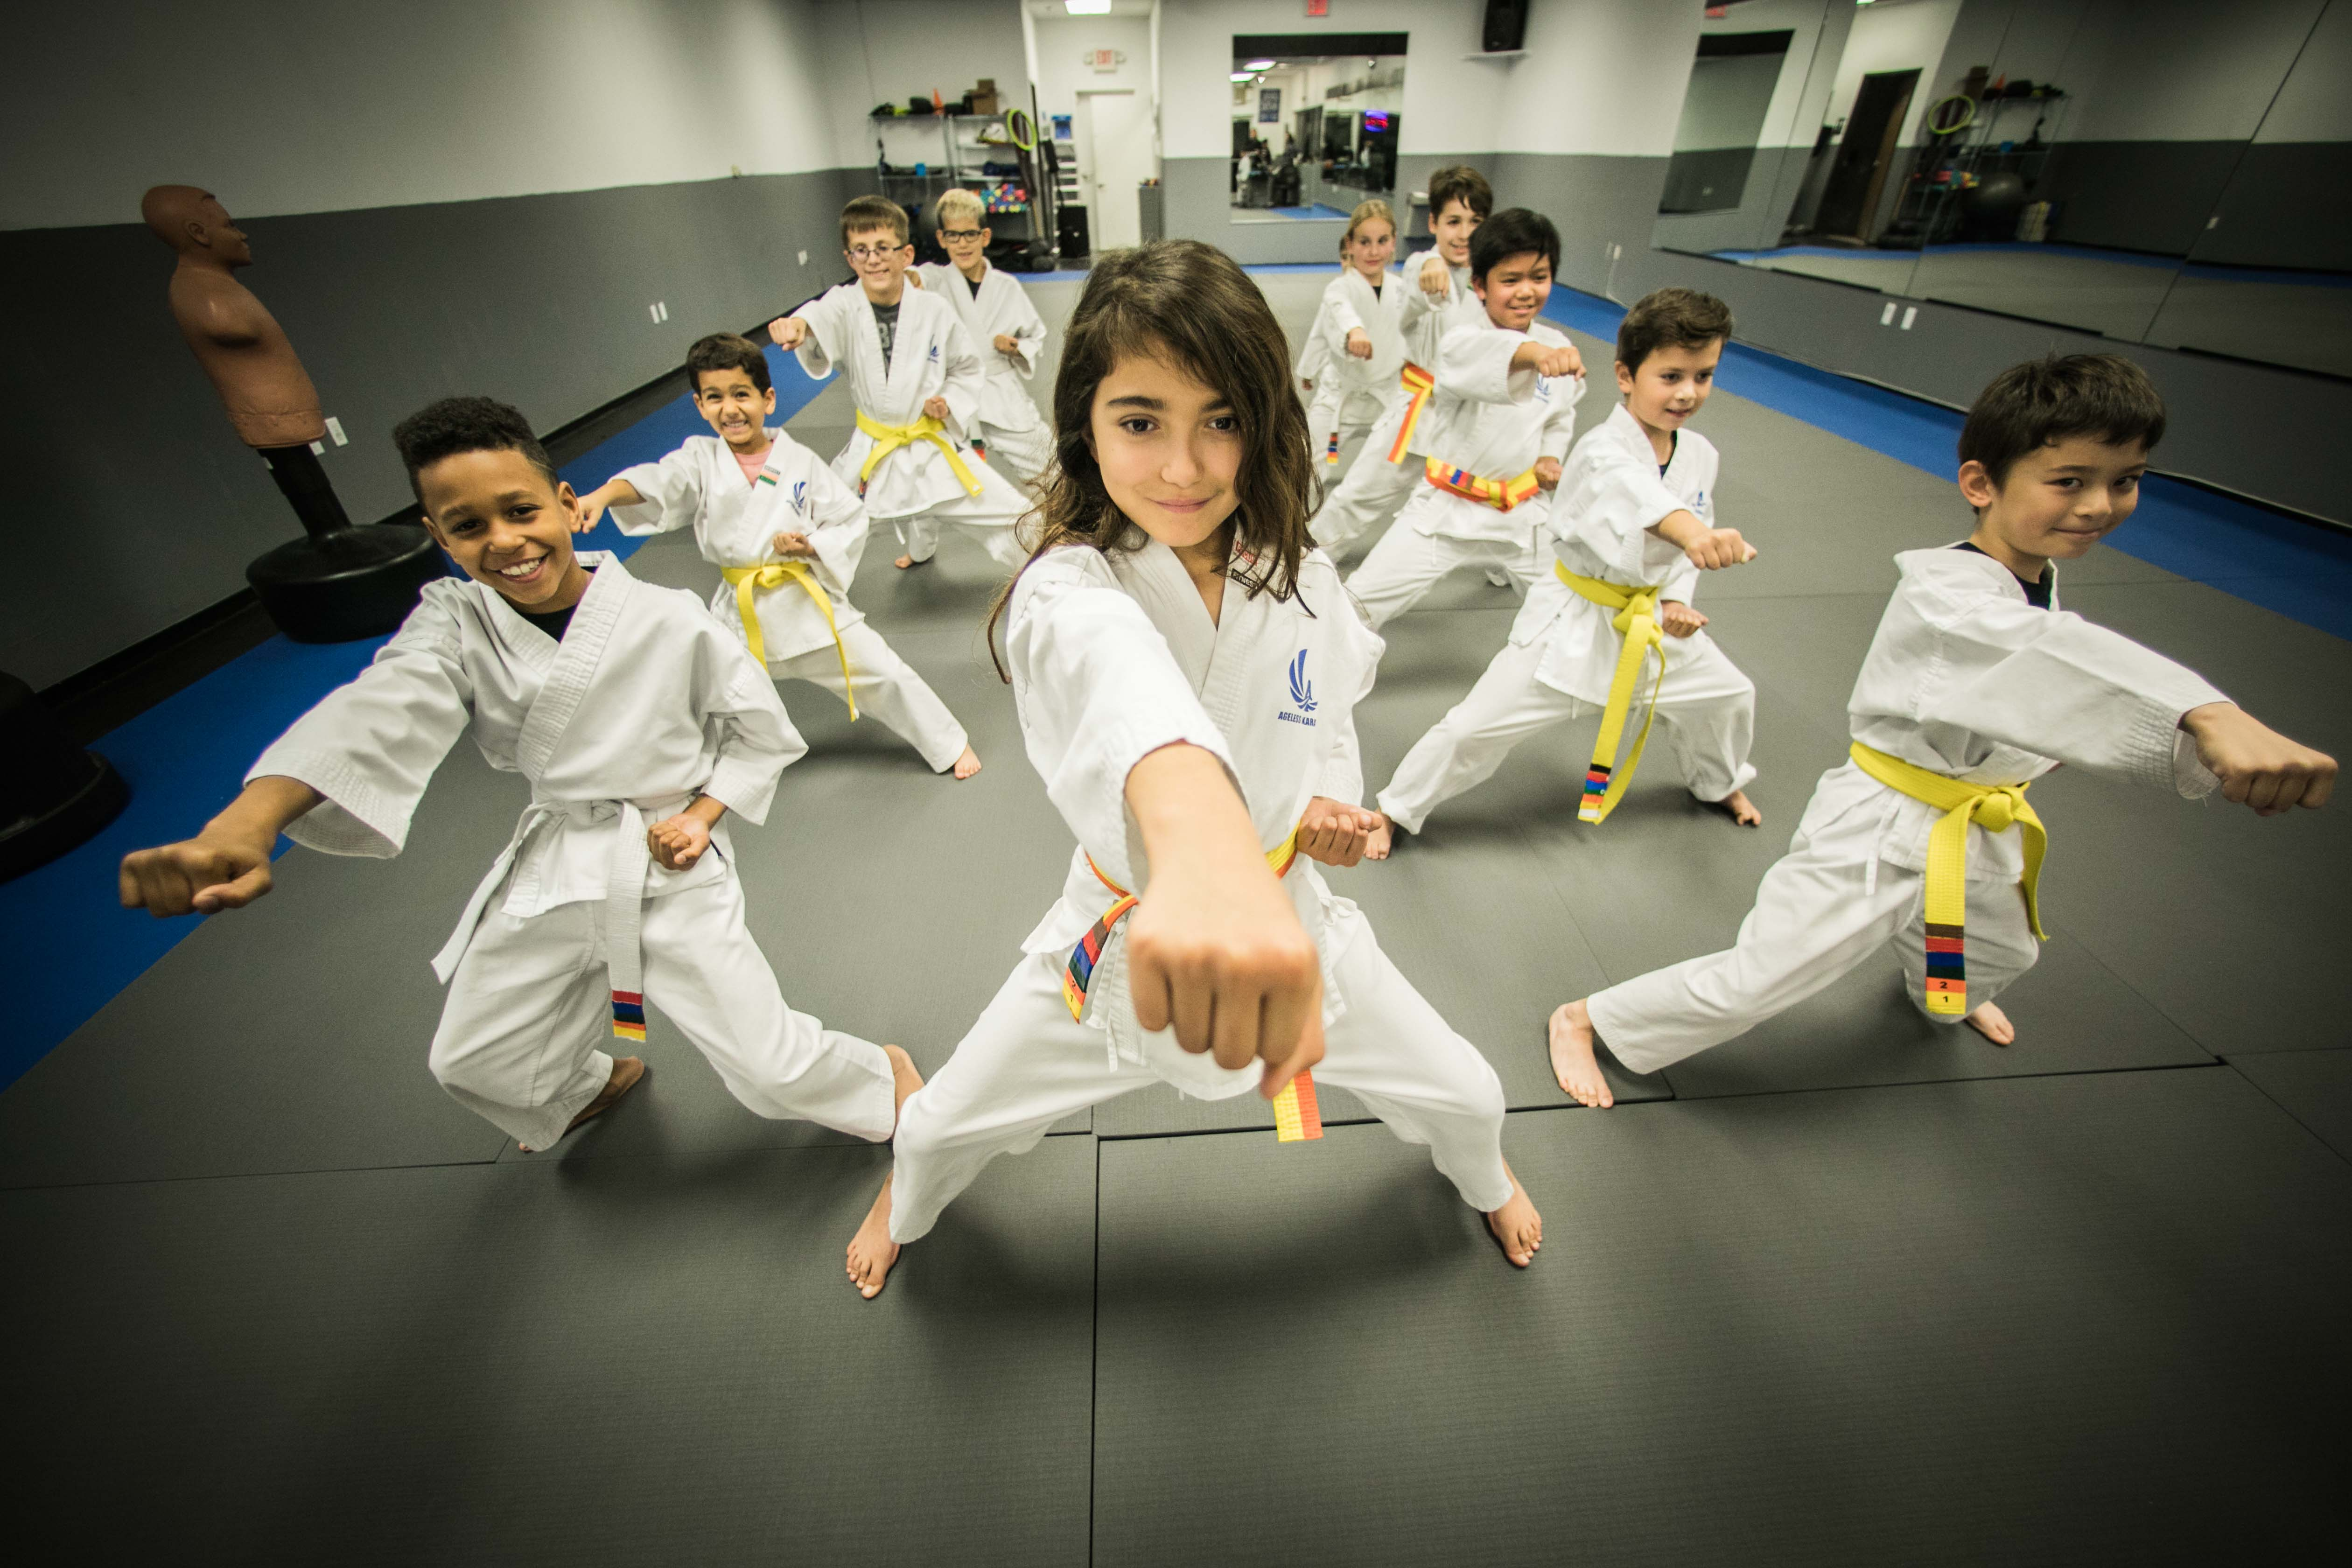 Las Vegas Kids Karate, kids karate near me, shotokan